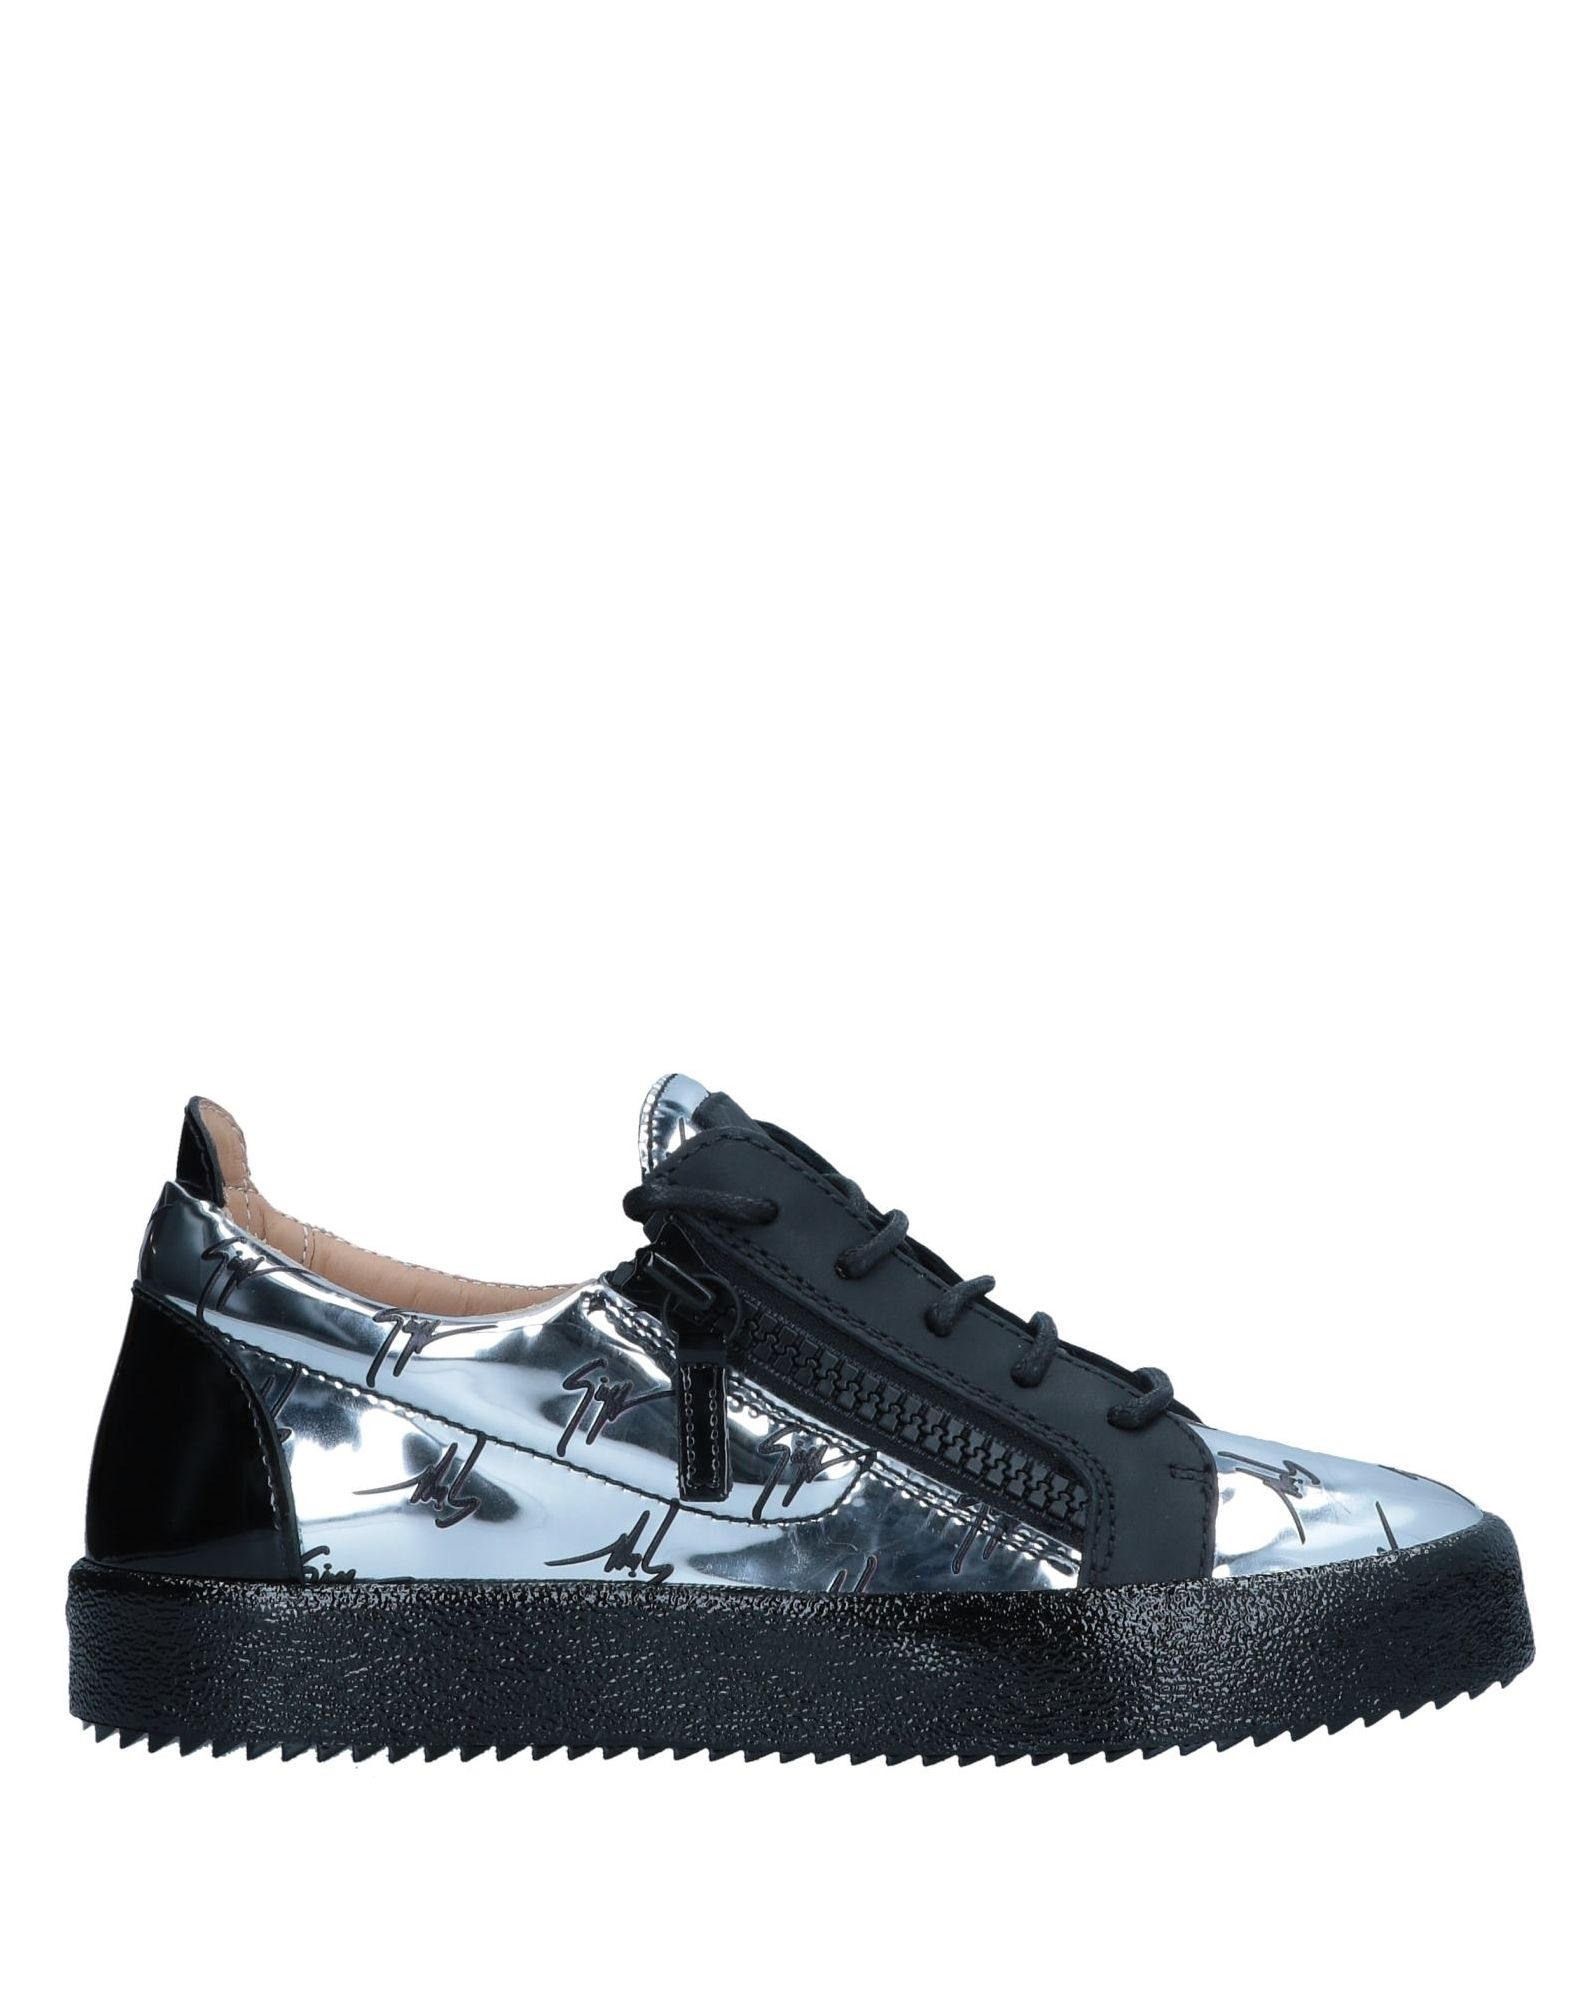 Giuseppe Zanotti Sneakers - Women Giuseppe Zanotti Sneakers online 11547434UV on  Canada - 11547434UV online bf220b